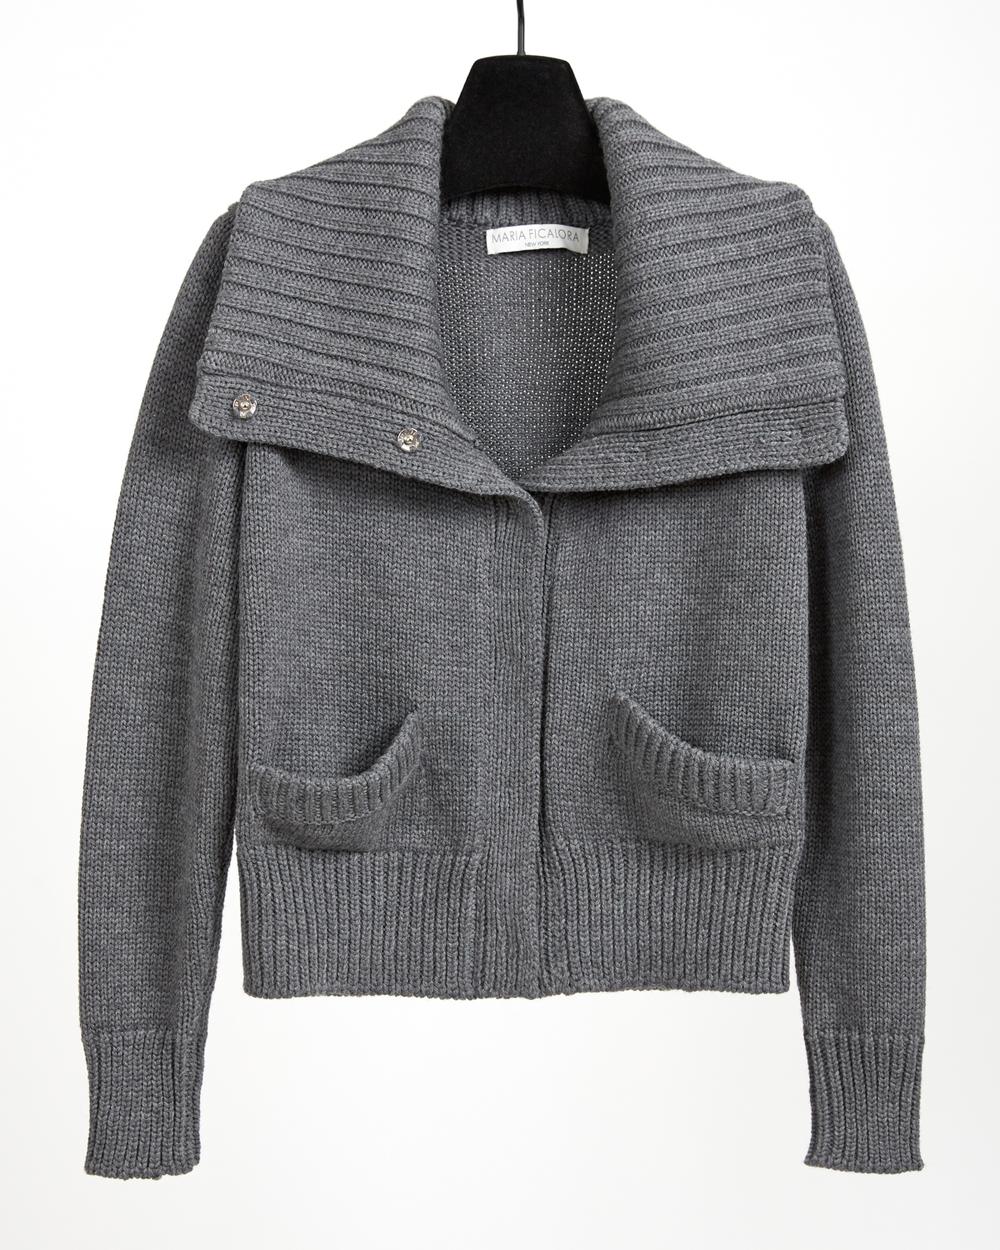 MF_Sweater3_643-rt.jpg